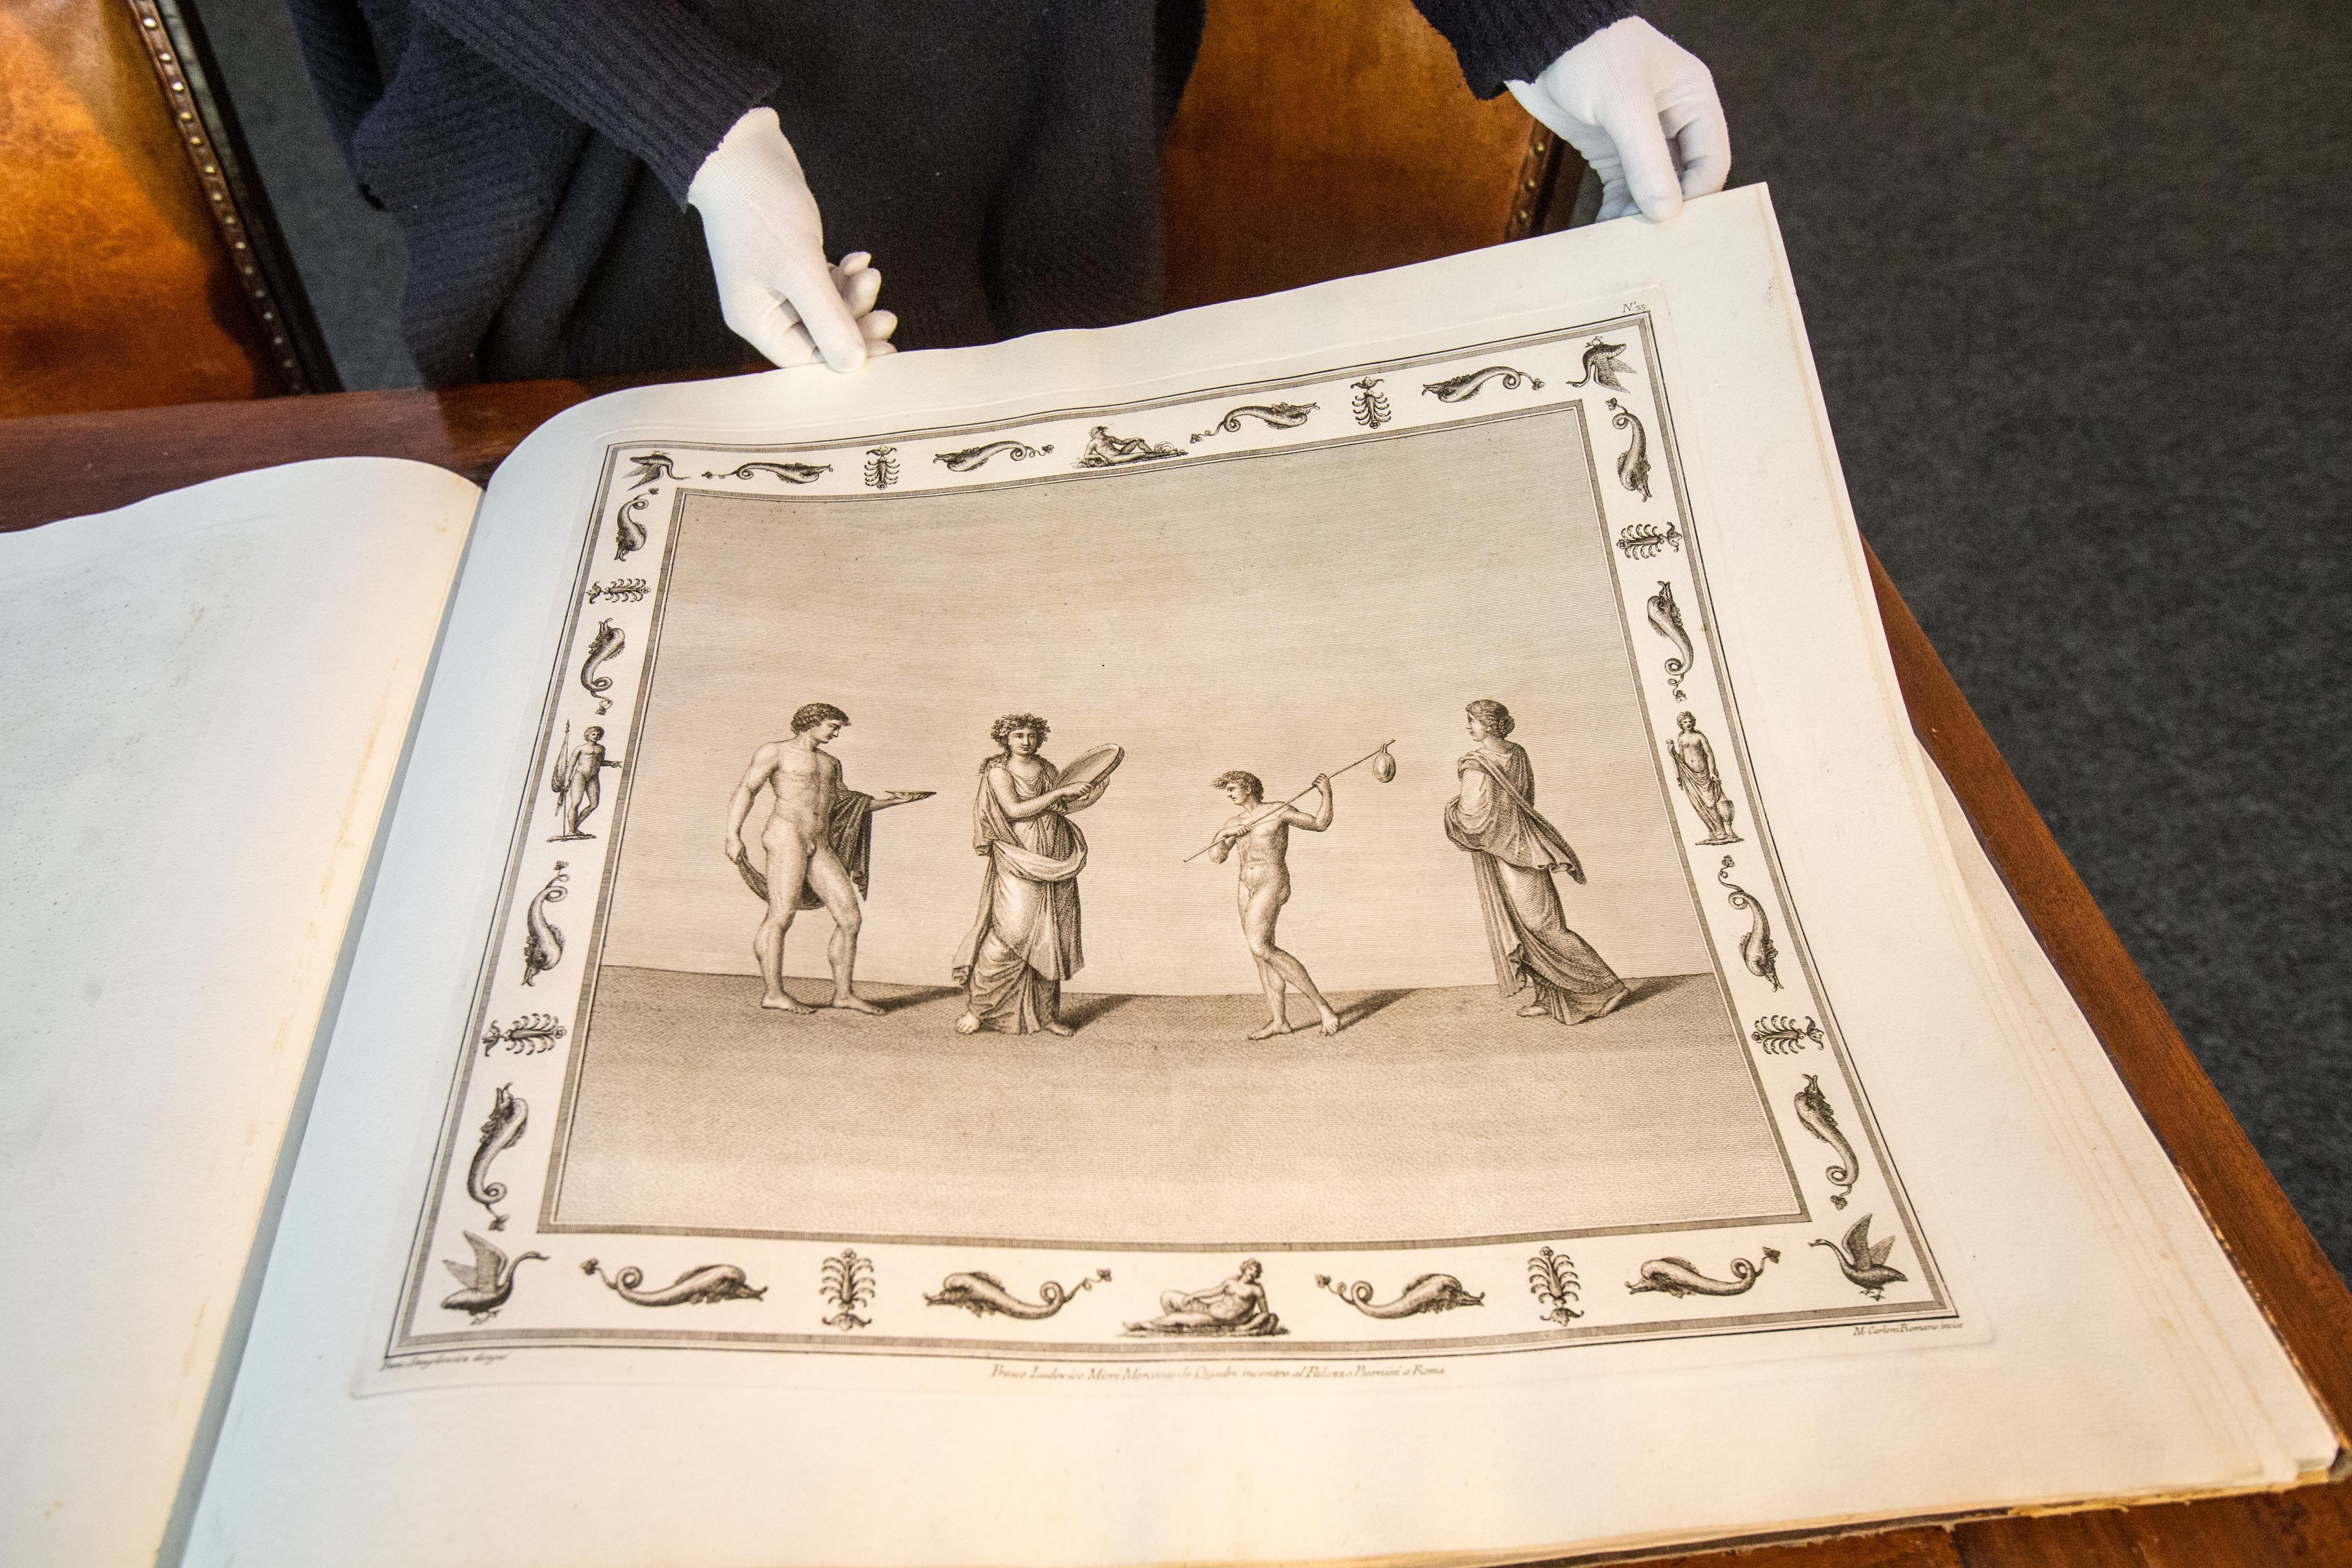 Pranci�kaus Smuglevi�iaus darbai i� priva�i� kolekcij�